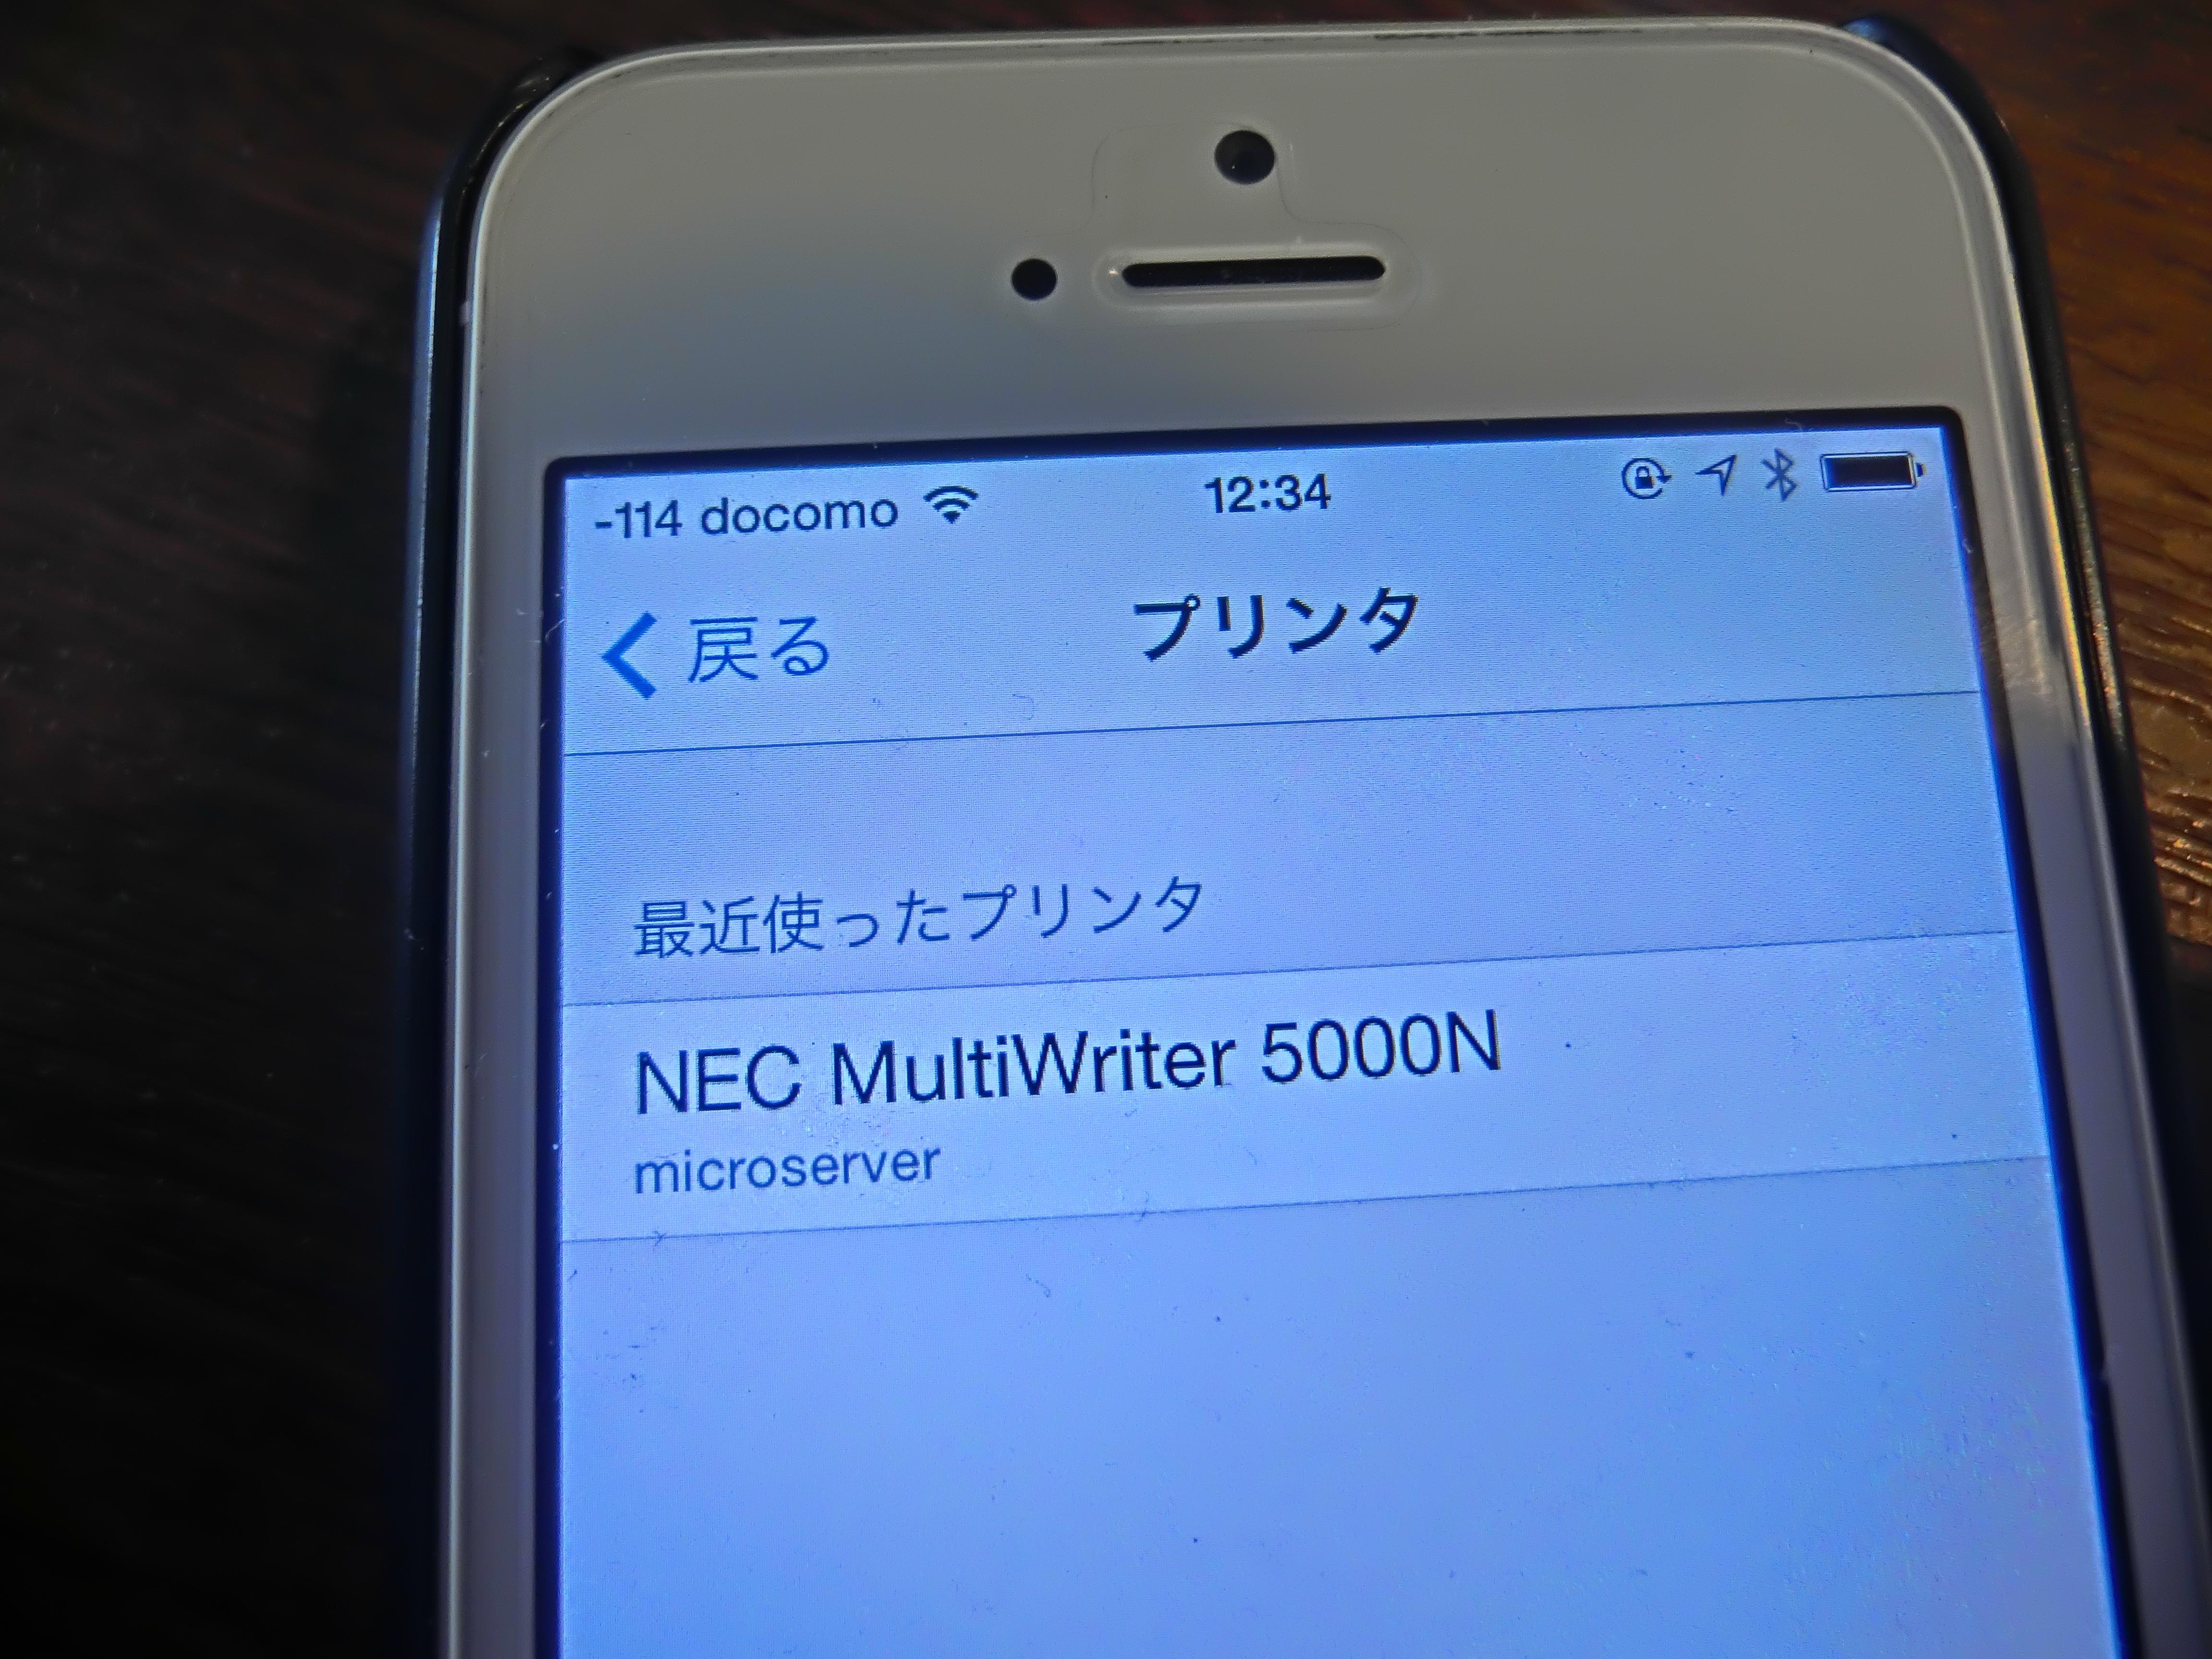 NEC MultiWriter 5000NをLinuxのCUPSから使ってみる